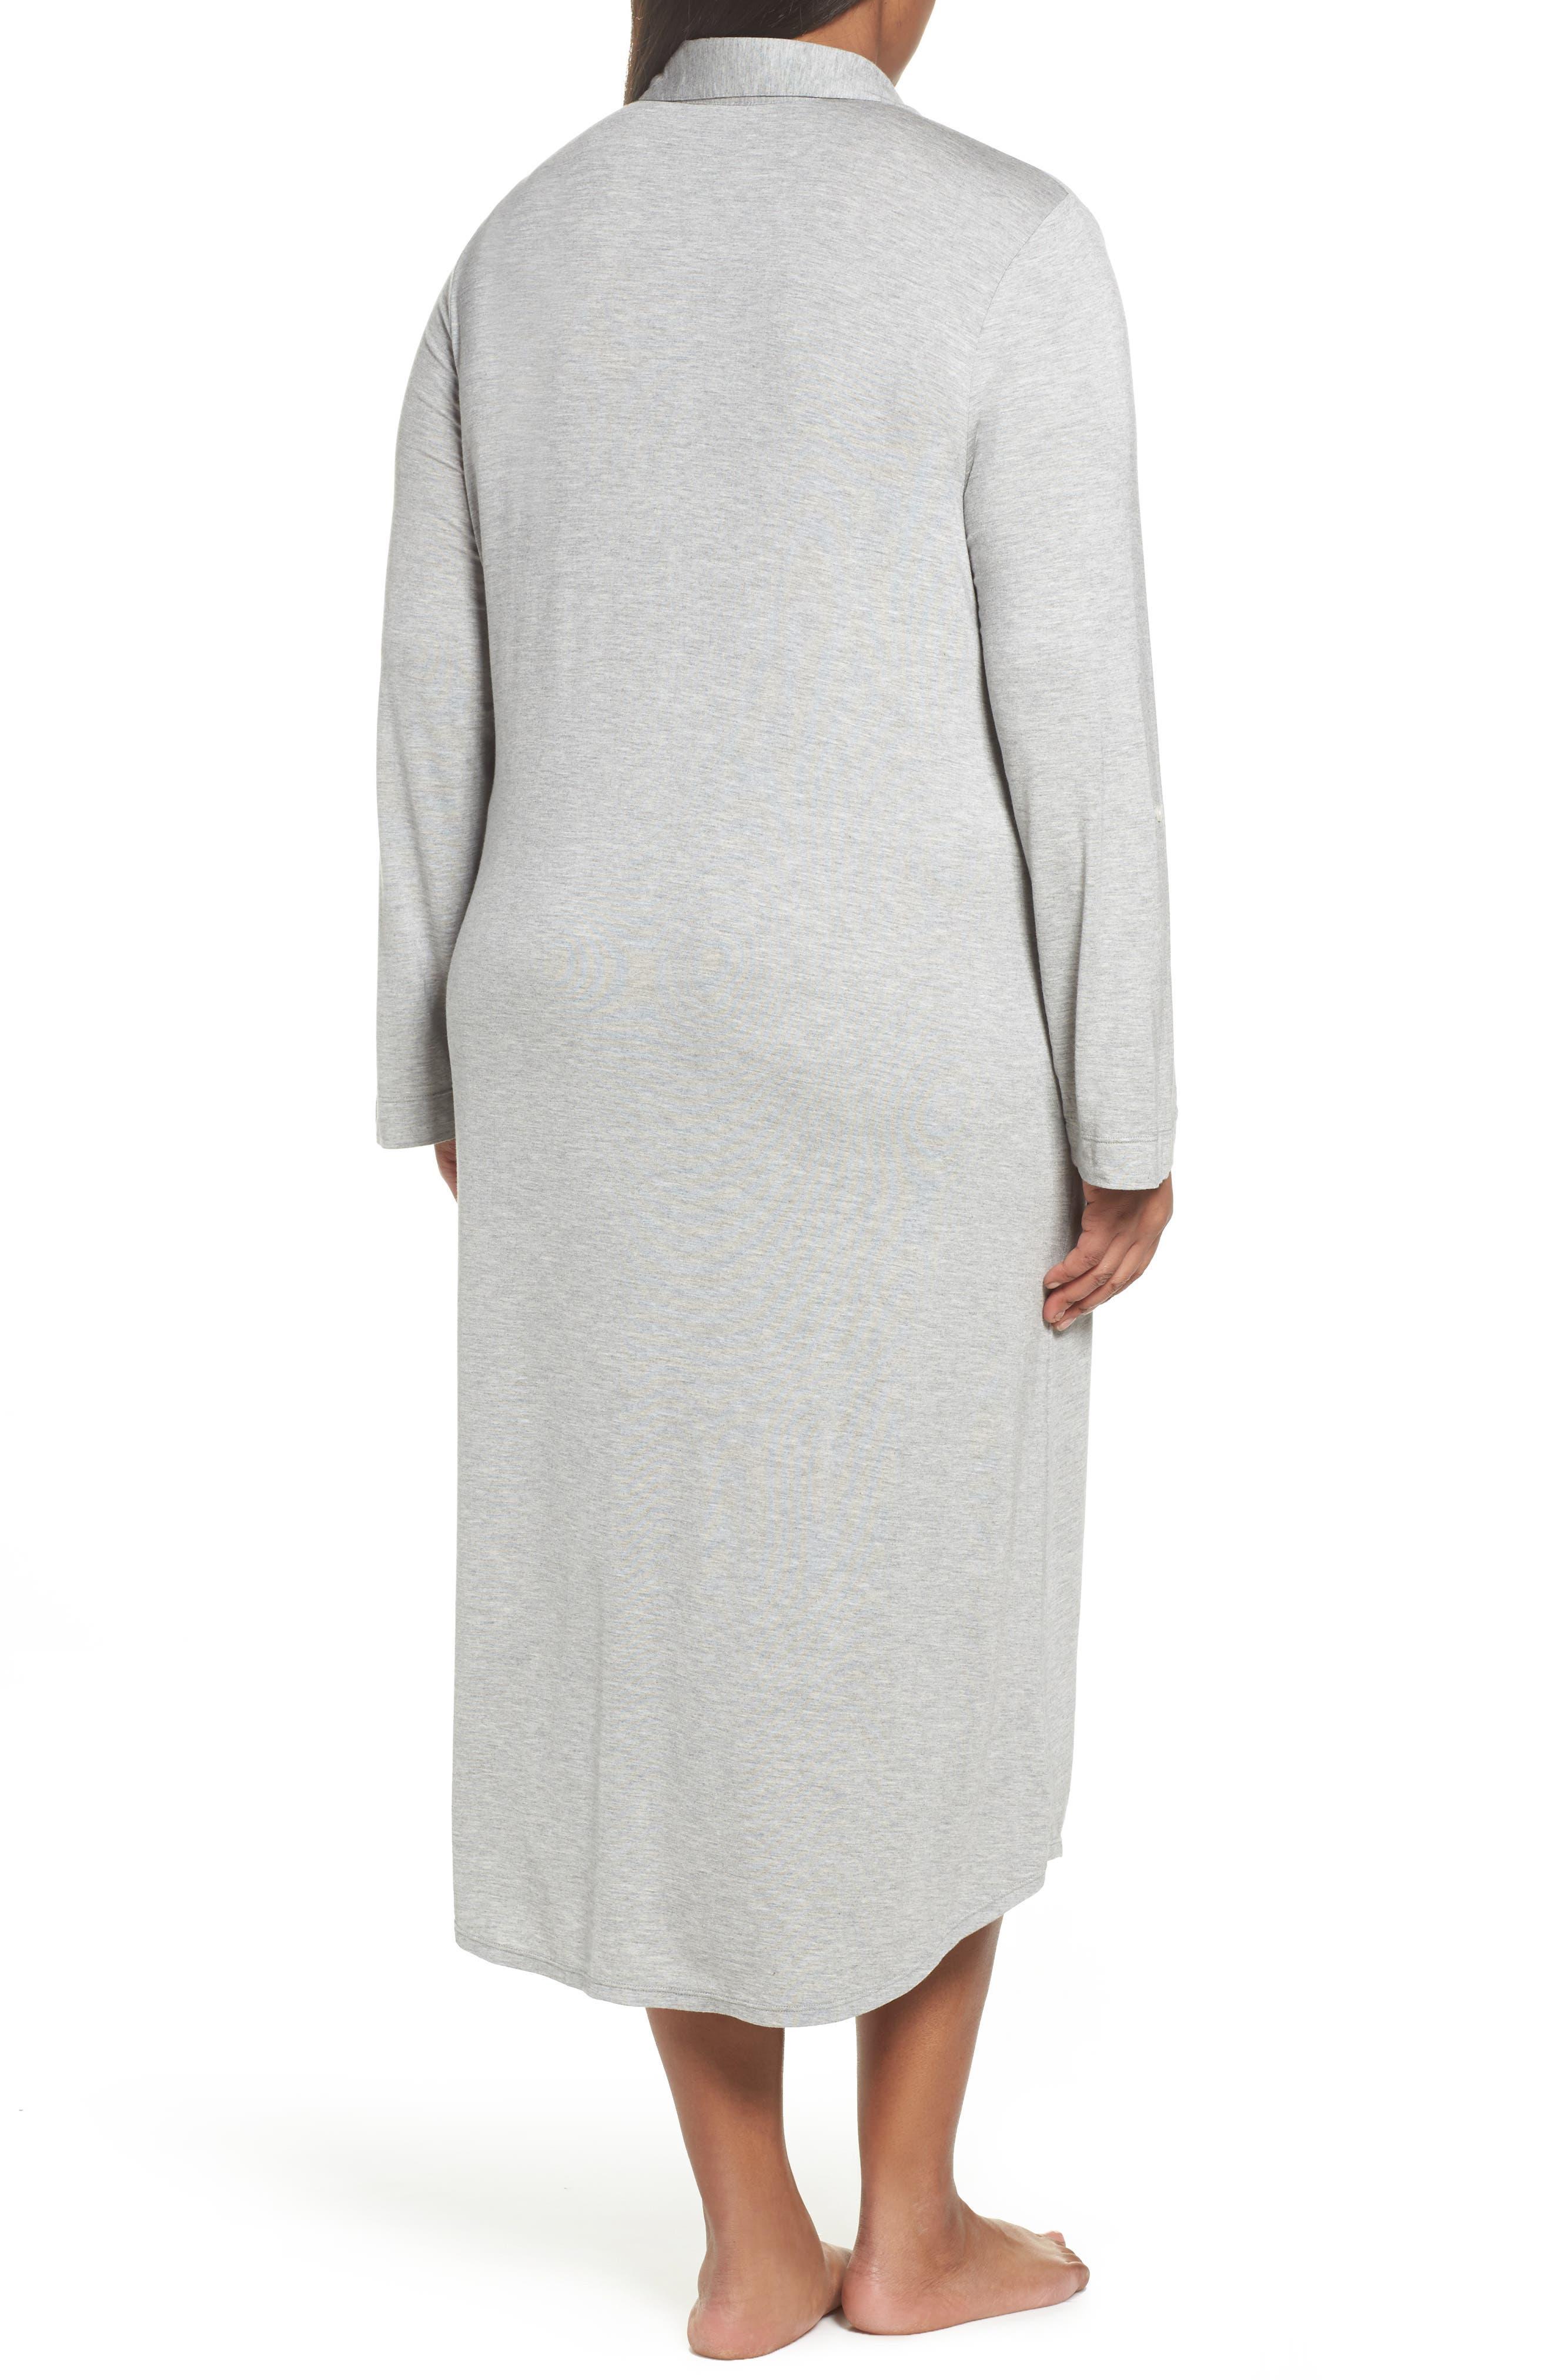 Long Night Shirt,                             Alternate thumbnail 2, color,                             Heather Grey Feeder Stripe